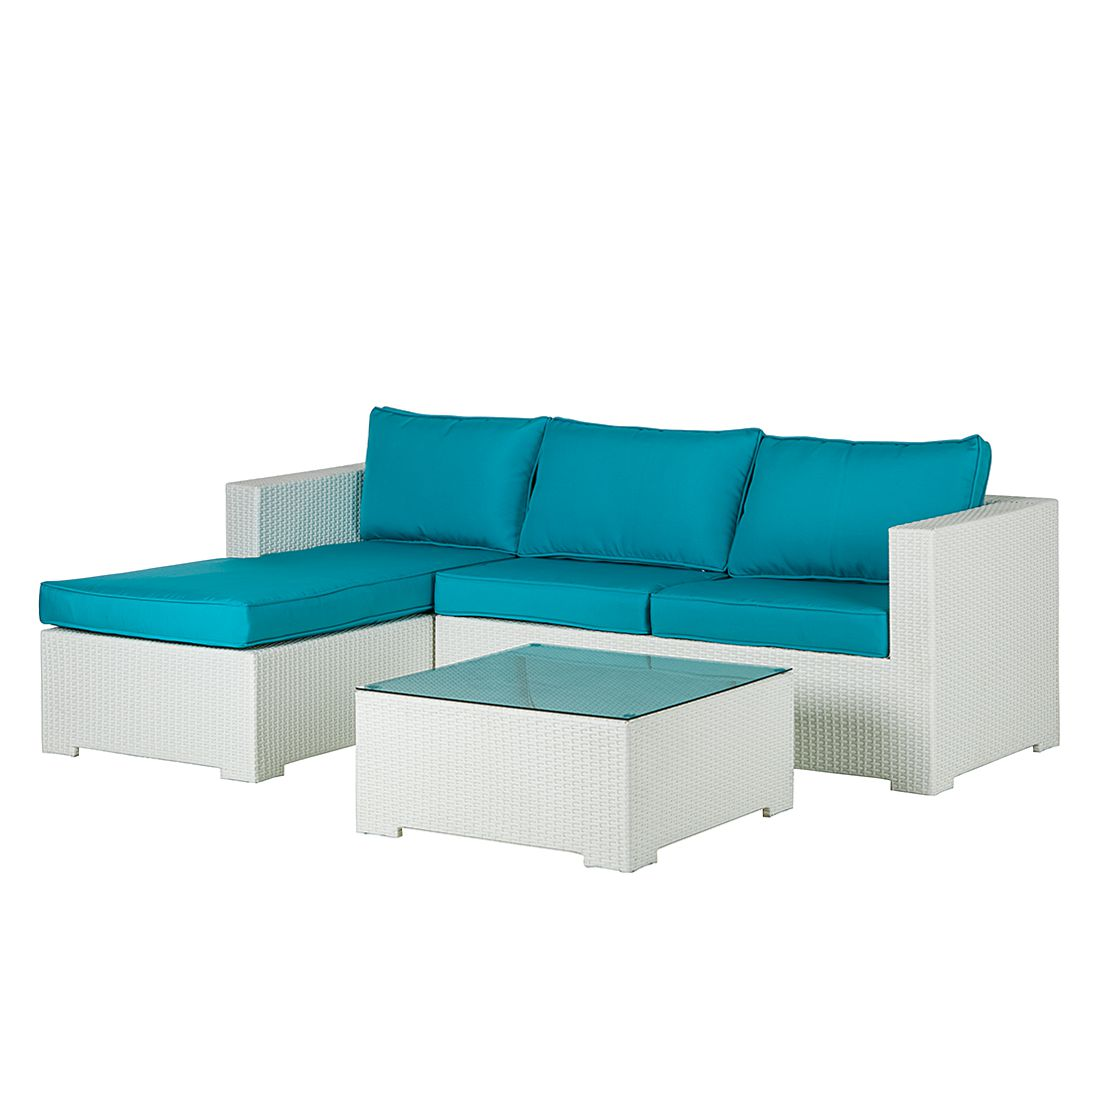 Lounge Sitzgruppe White Comfort (3-teilig) - Polyrattan/Textil - Weiß/Türkis, Kings Garden